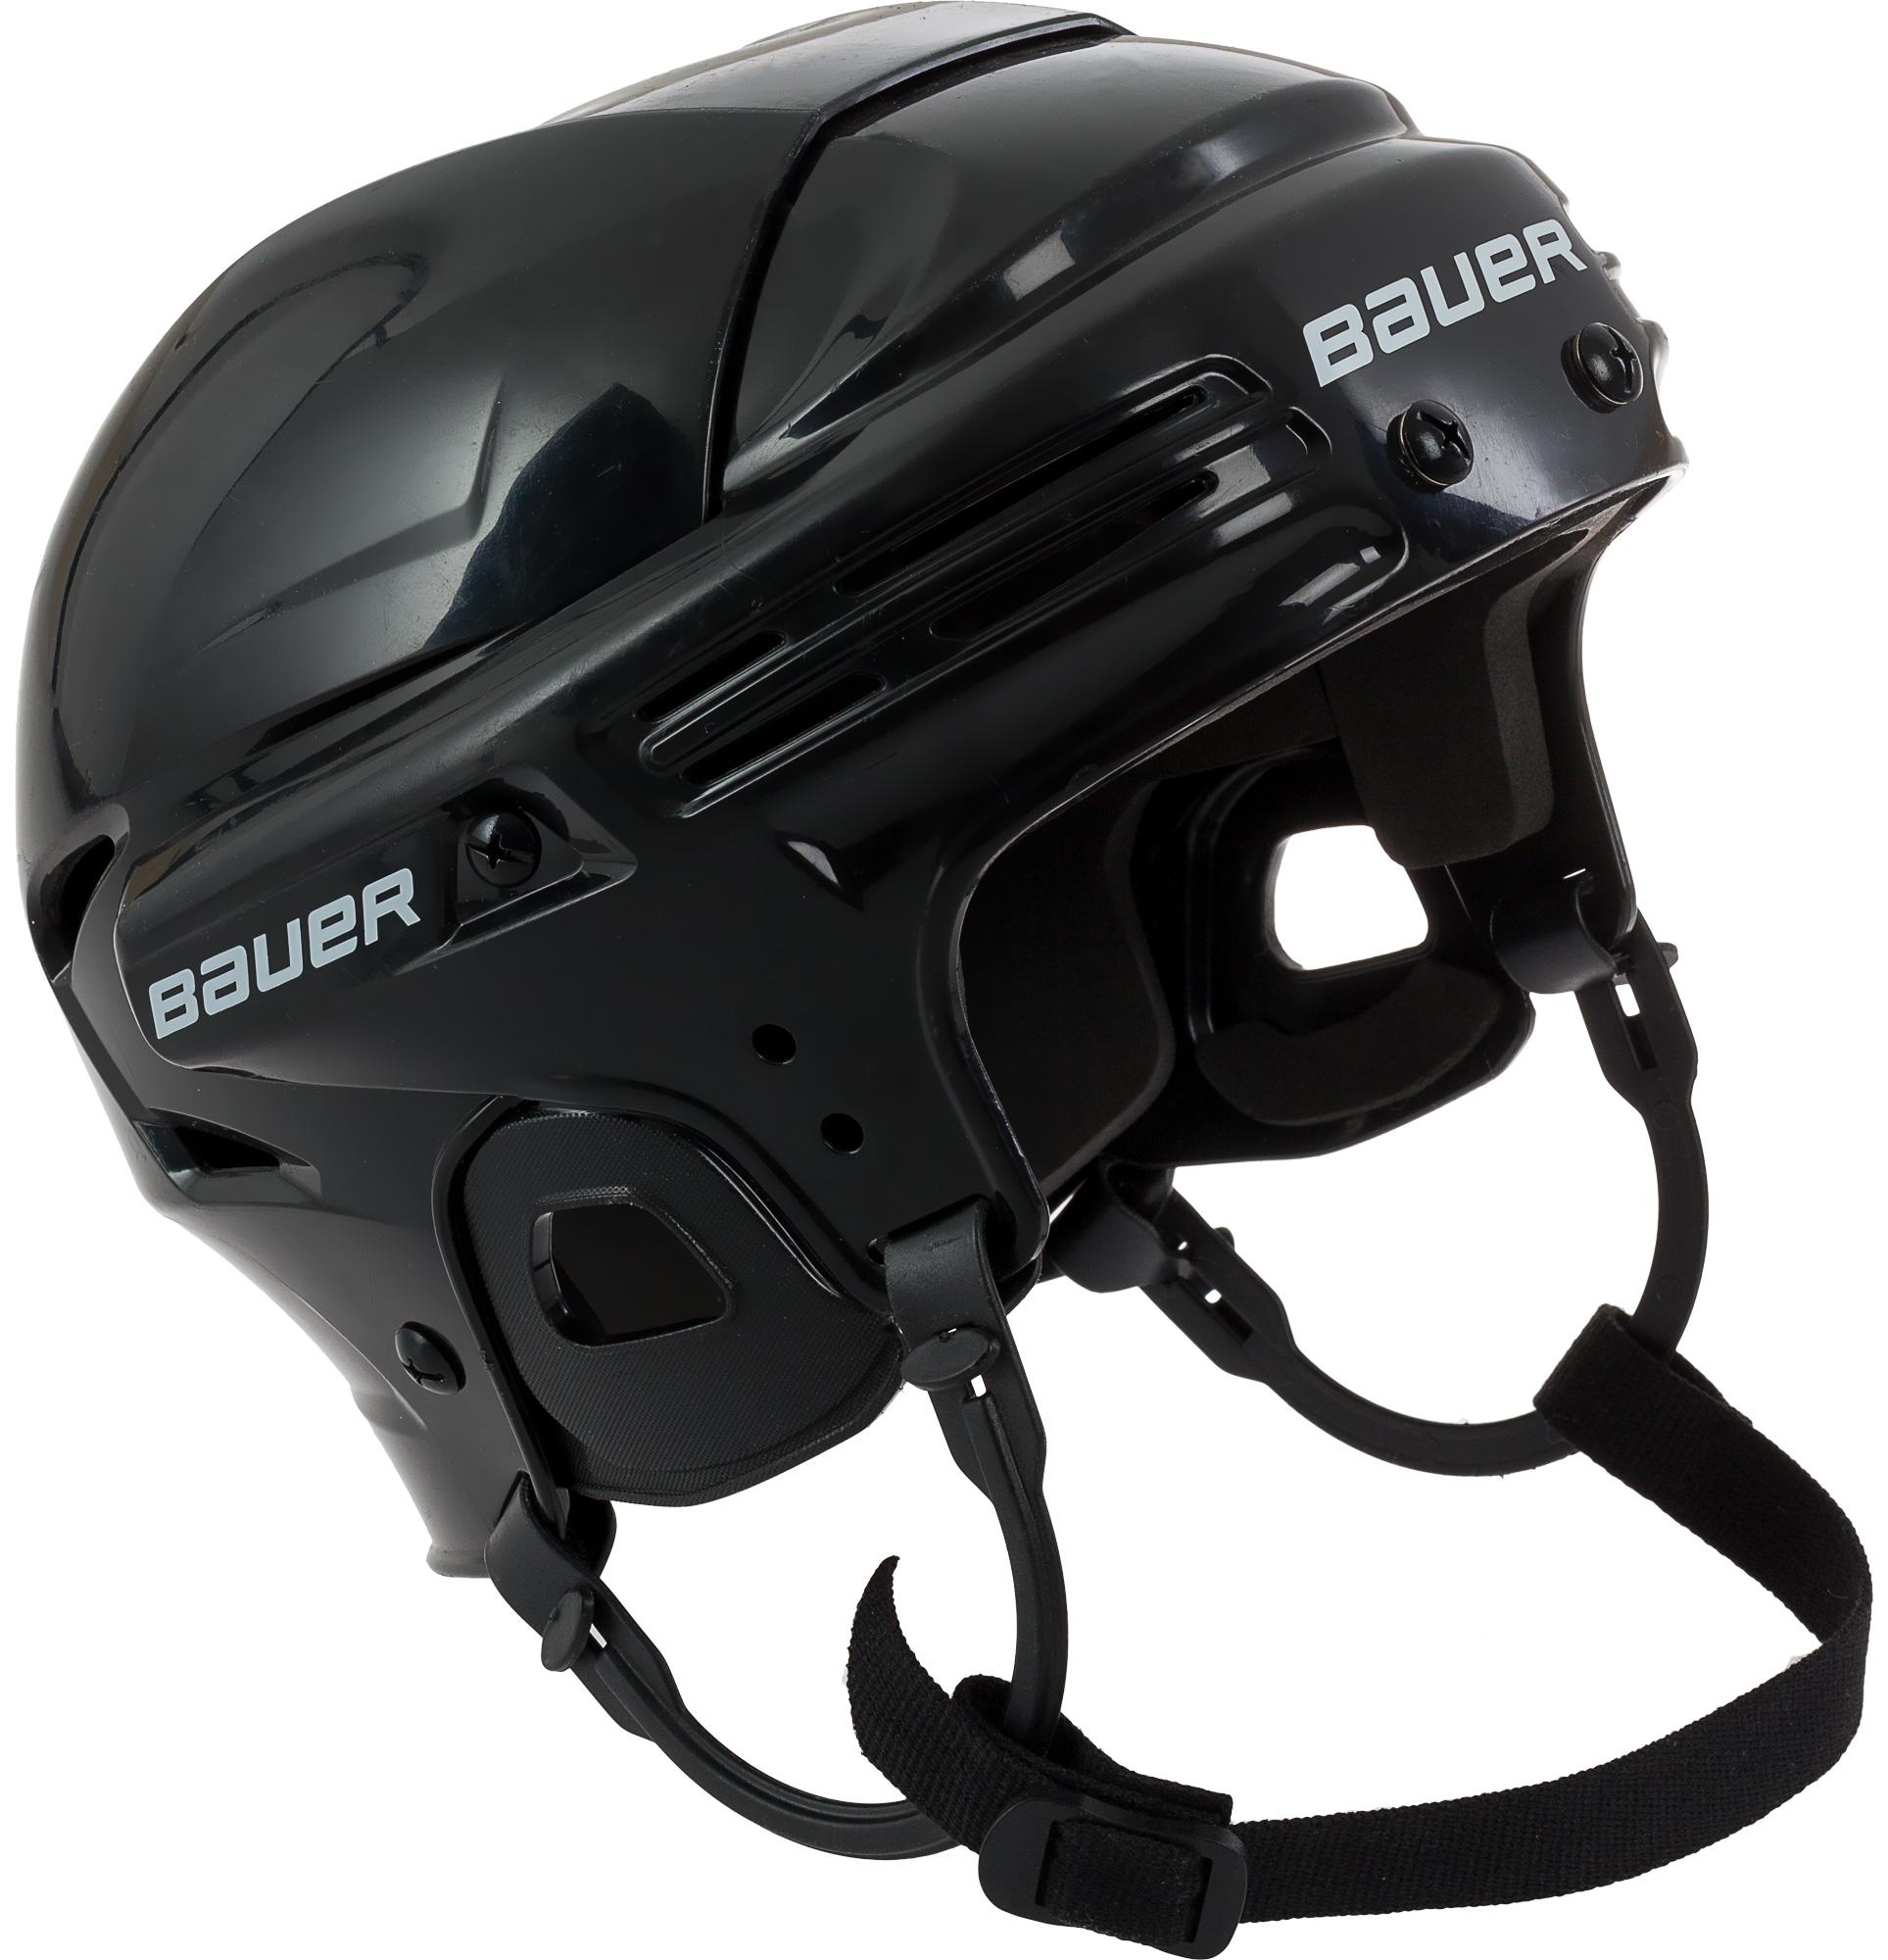 Bauer Шлем хоккейный Bauer 2100 детский шлем hh 2100 combo